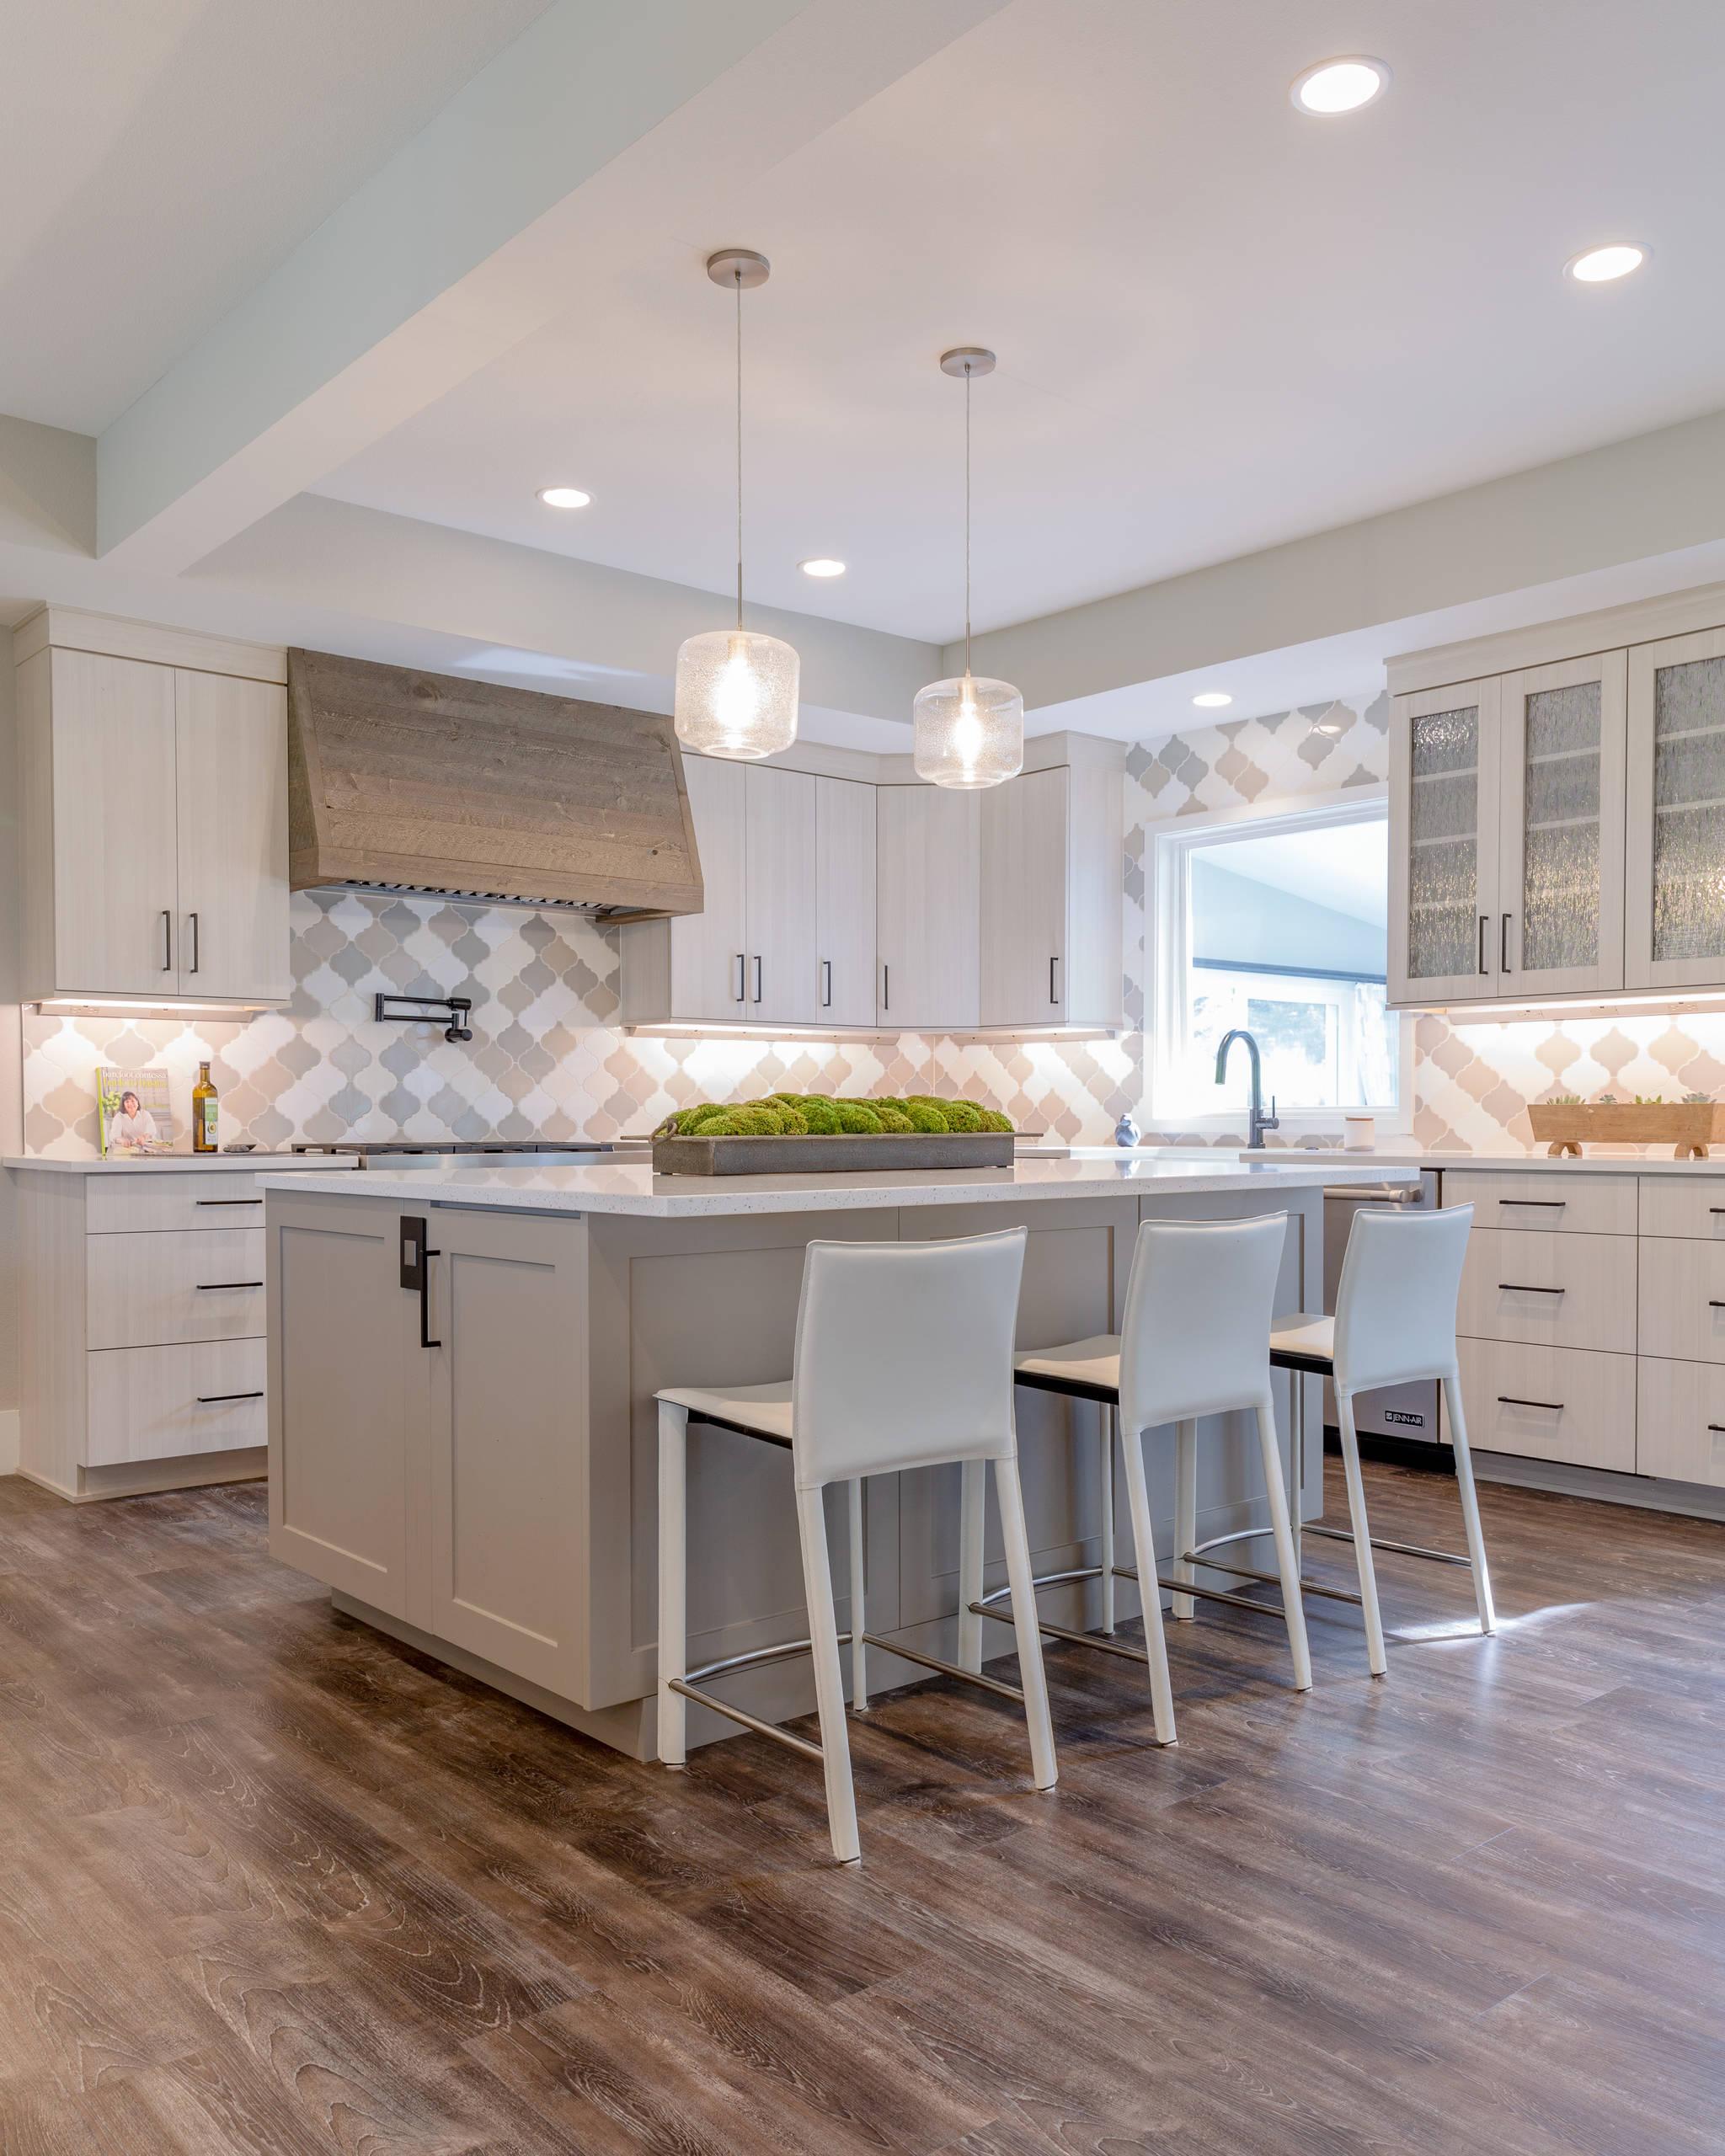 75 Laminate Floor Kitchen Ideas You Ll, Laminate Wood Flooring Kitchen